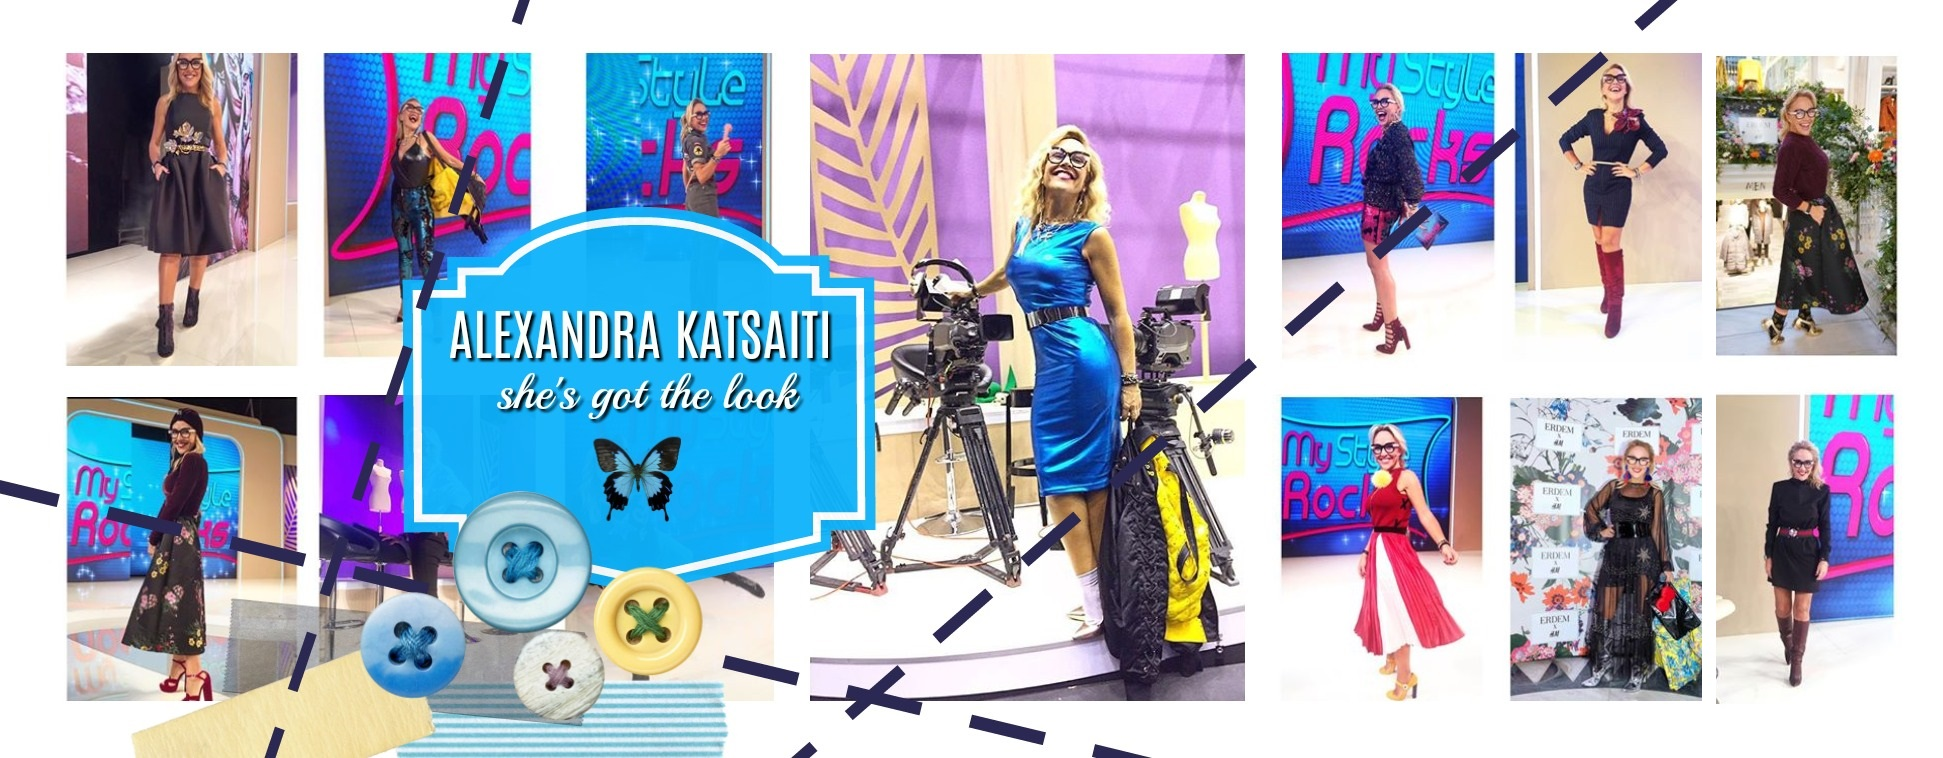 Alexandra Katsaiti Stylishious Fashion E-Shop